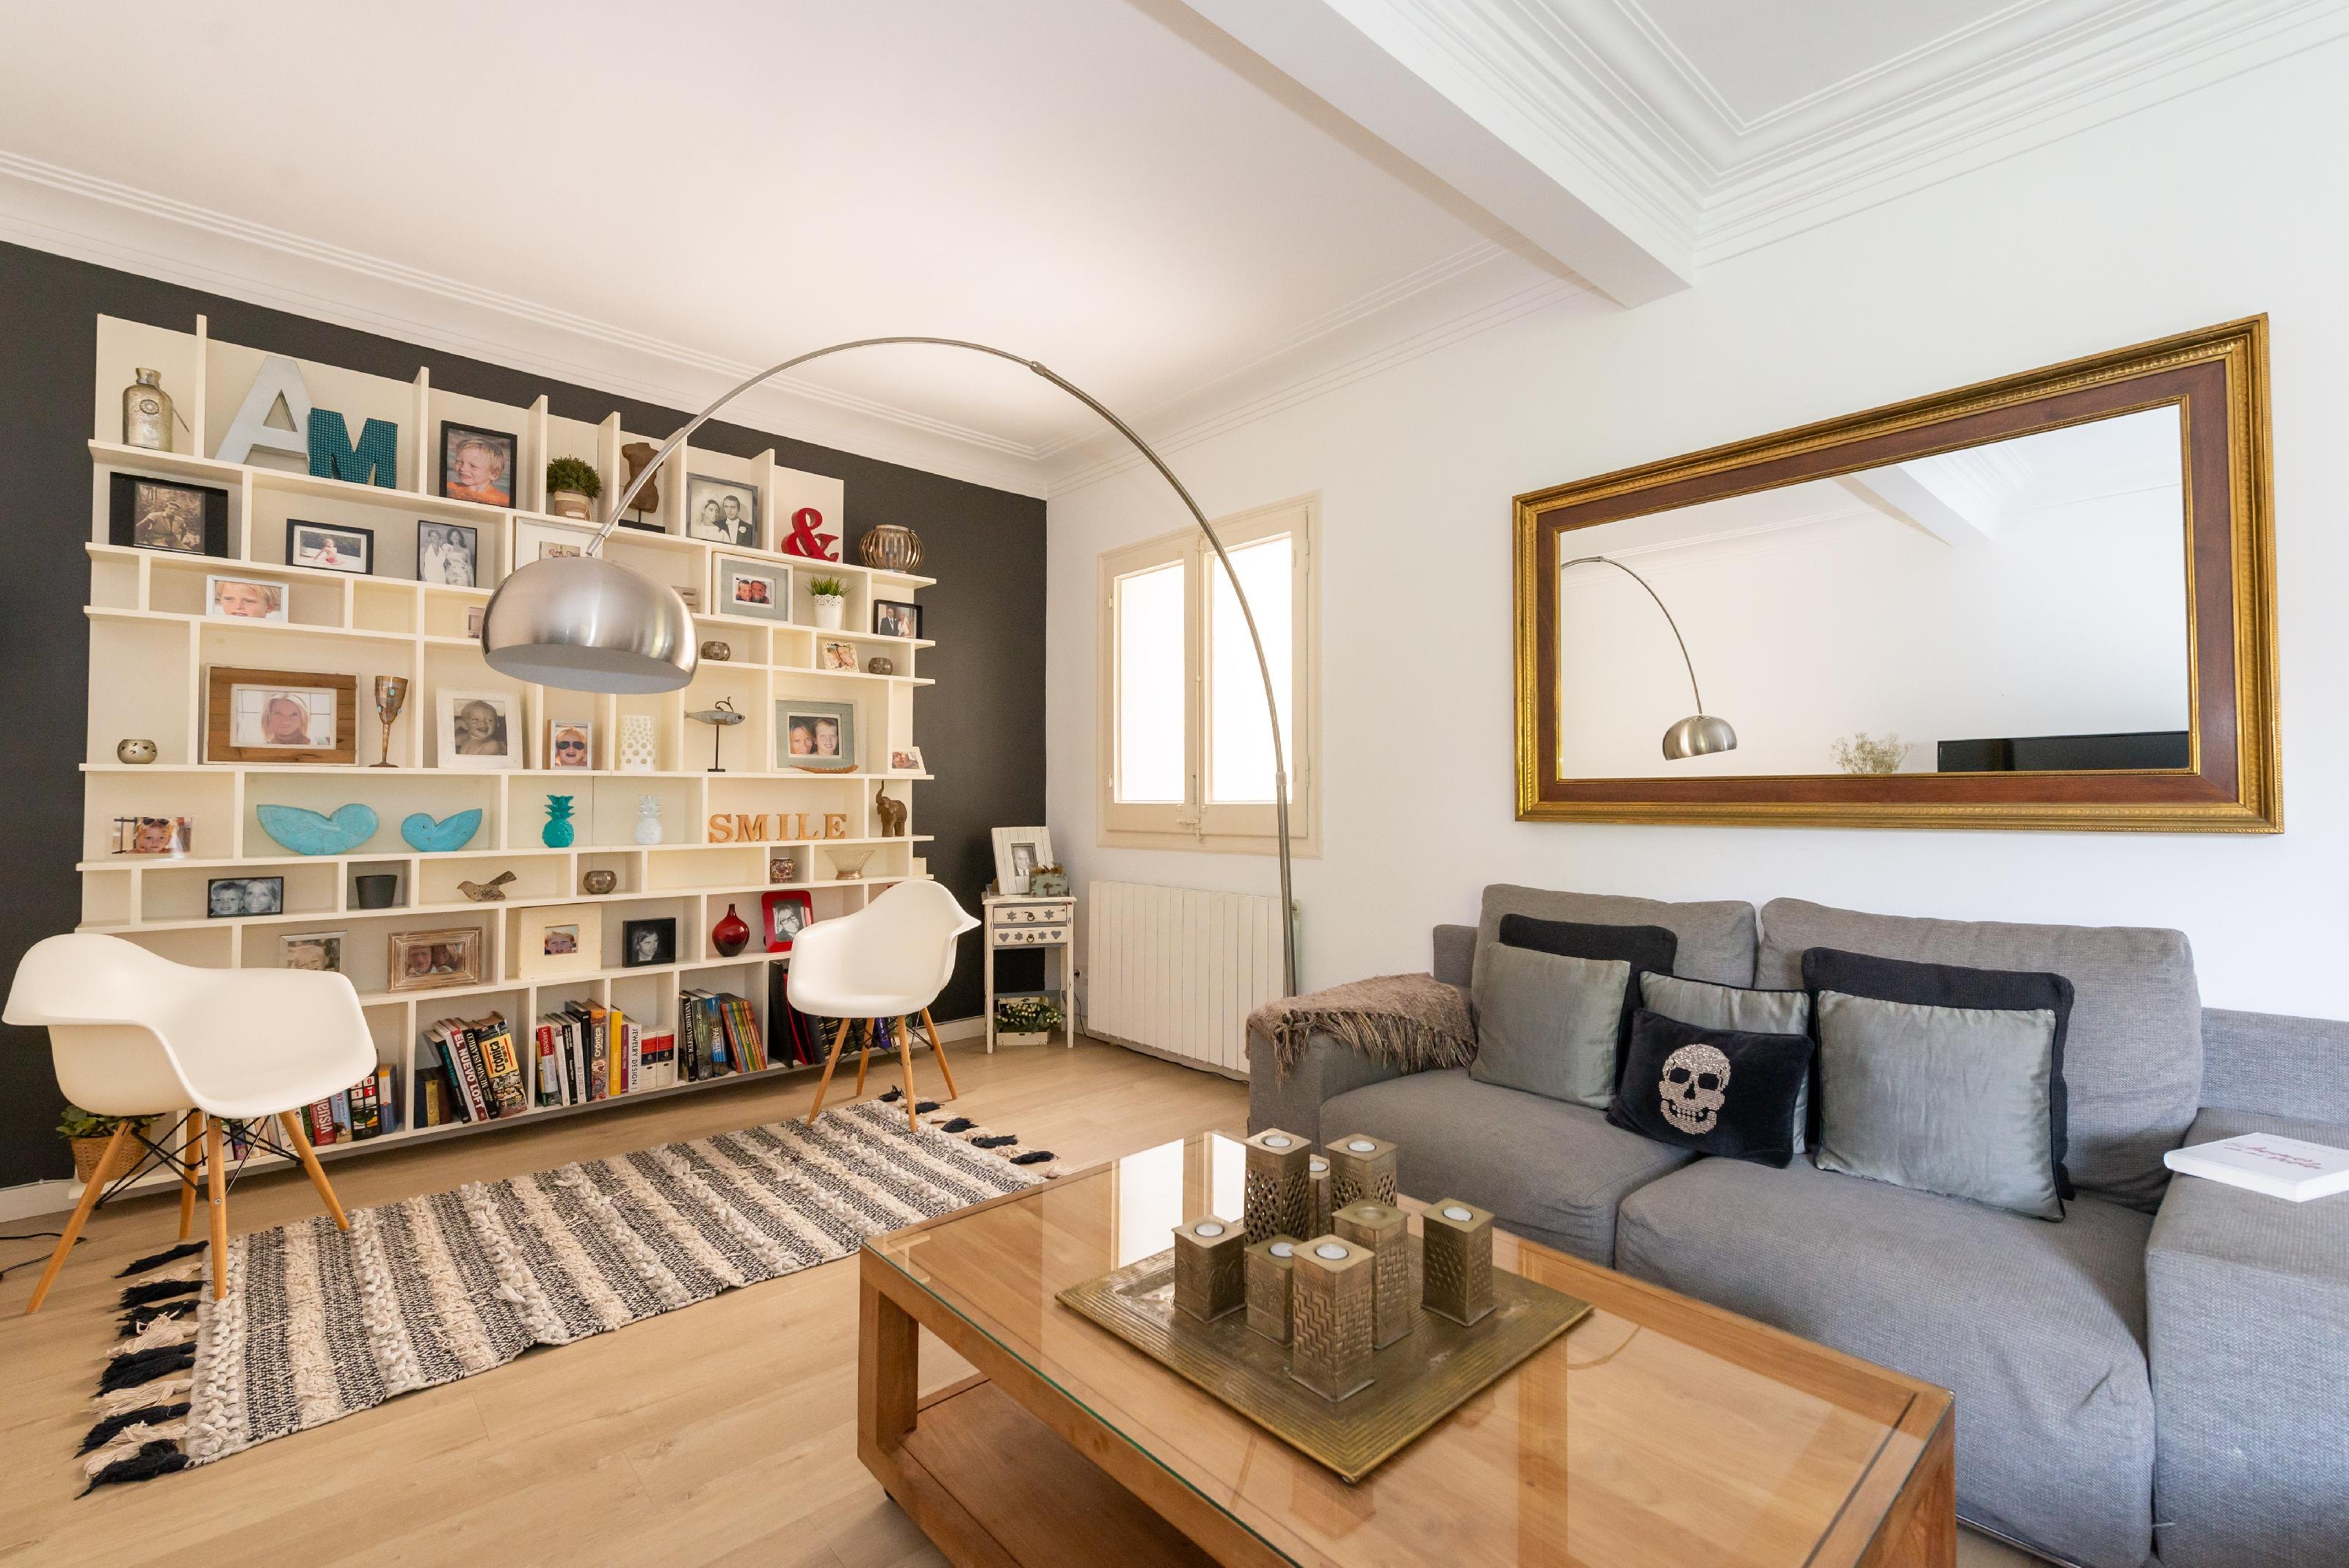 250005 Flat for sale in Sarrià-Sant Gervasi, Sant Gervasi-Galvany 6